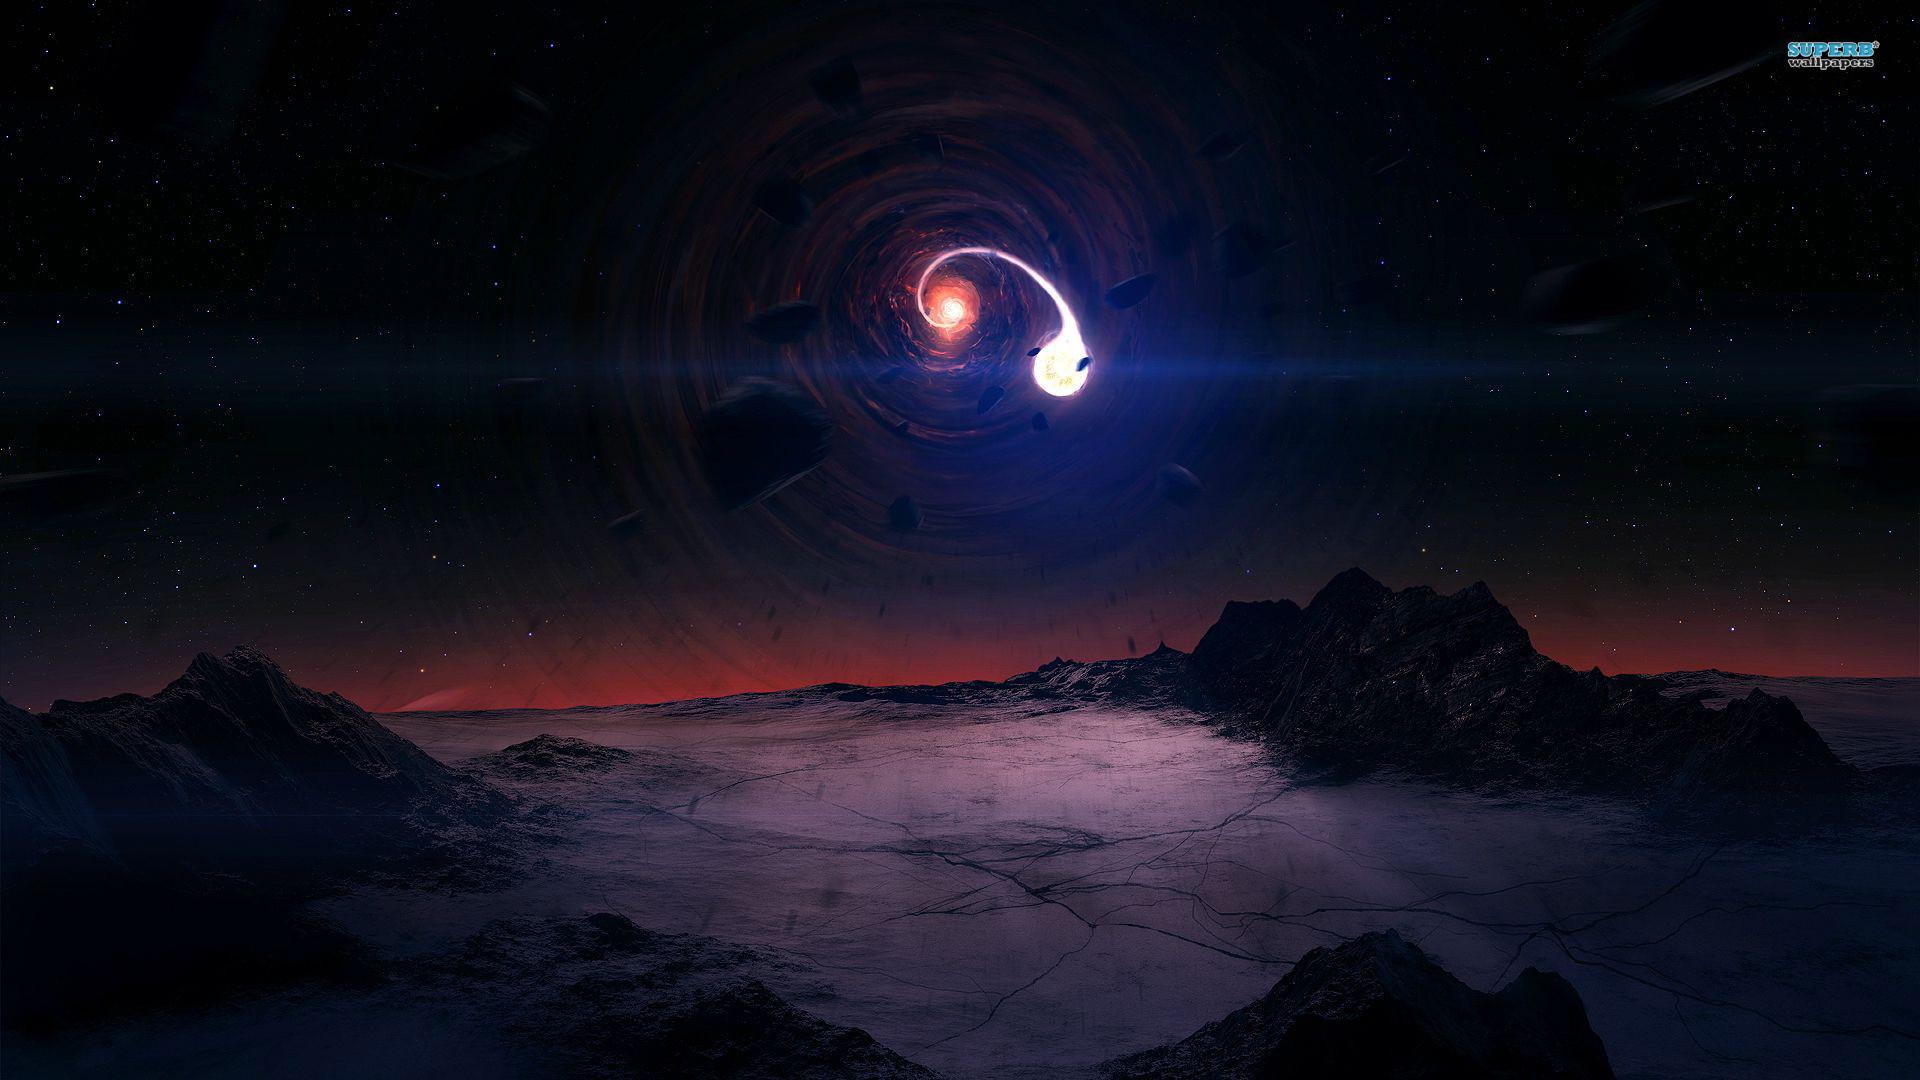 Interstellar Black Hole Gargantua HD desktop wallpaper High | HD Wallpapers  | Pinterest | Wallpaper